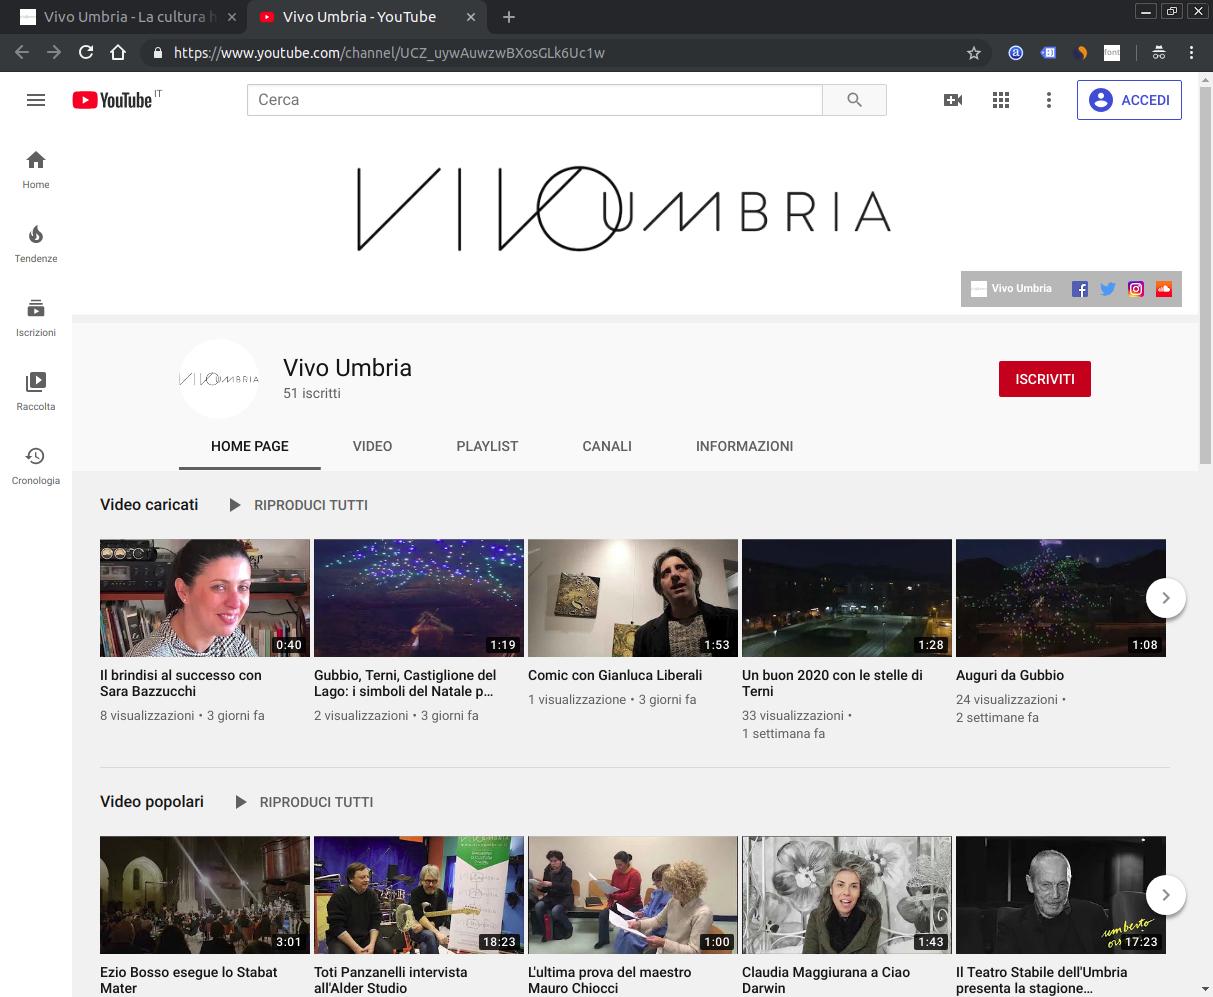 Screenshot del canale Youtube Vivo Umbria